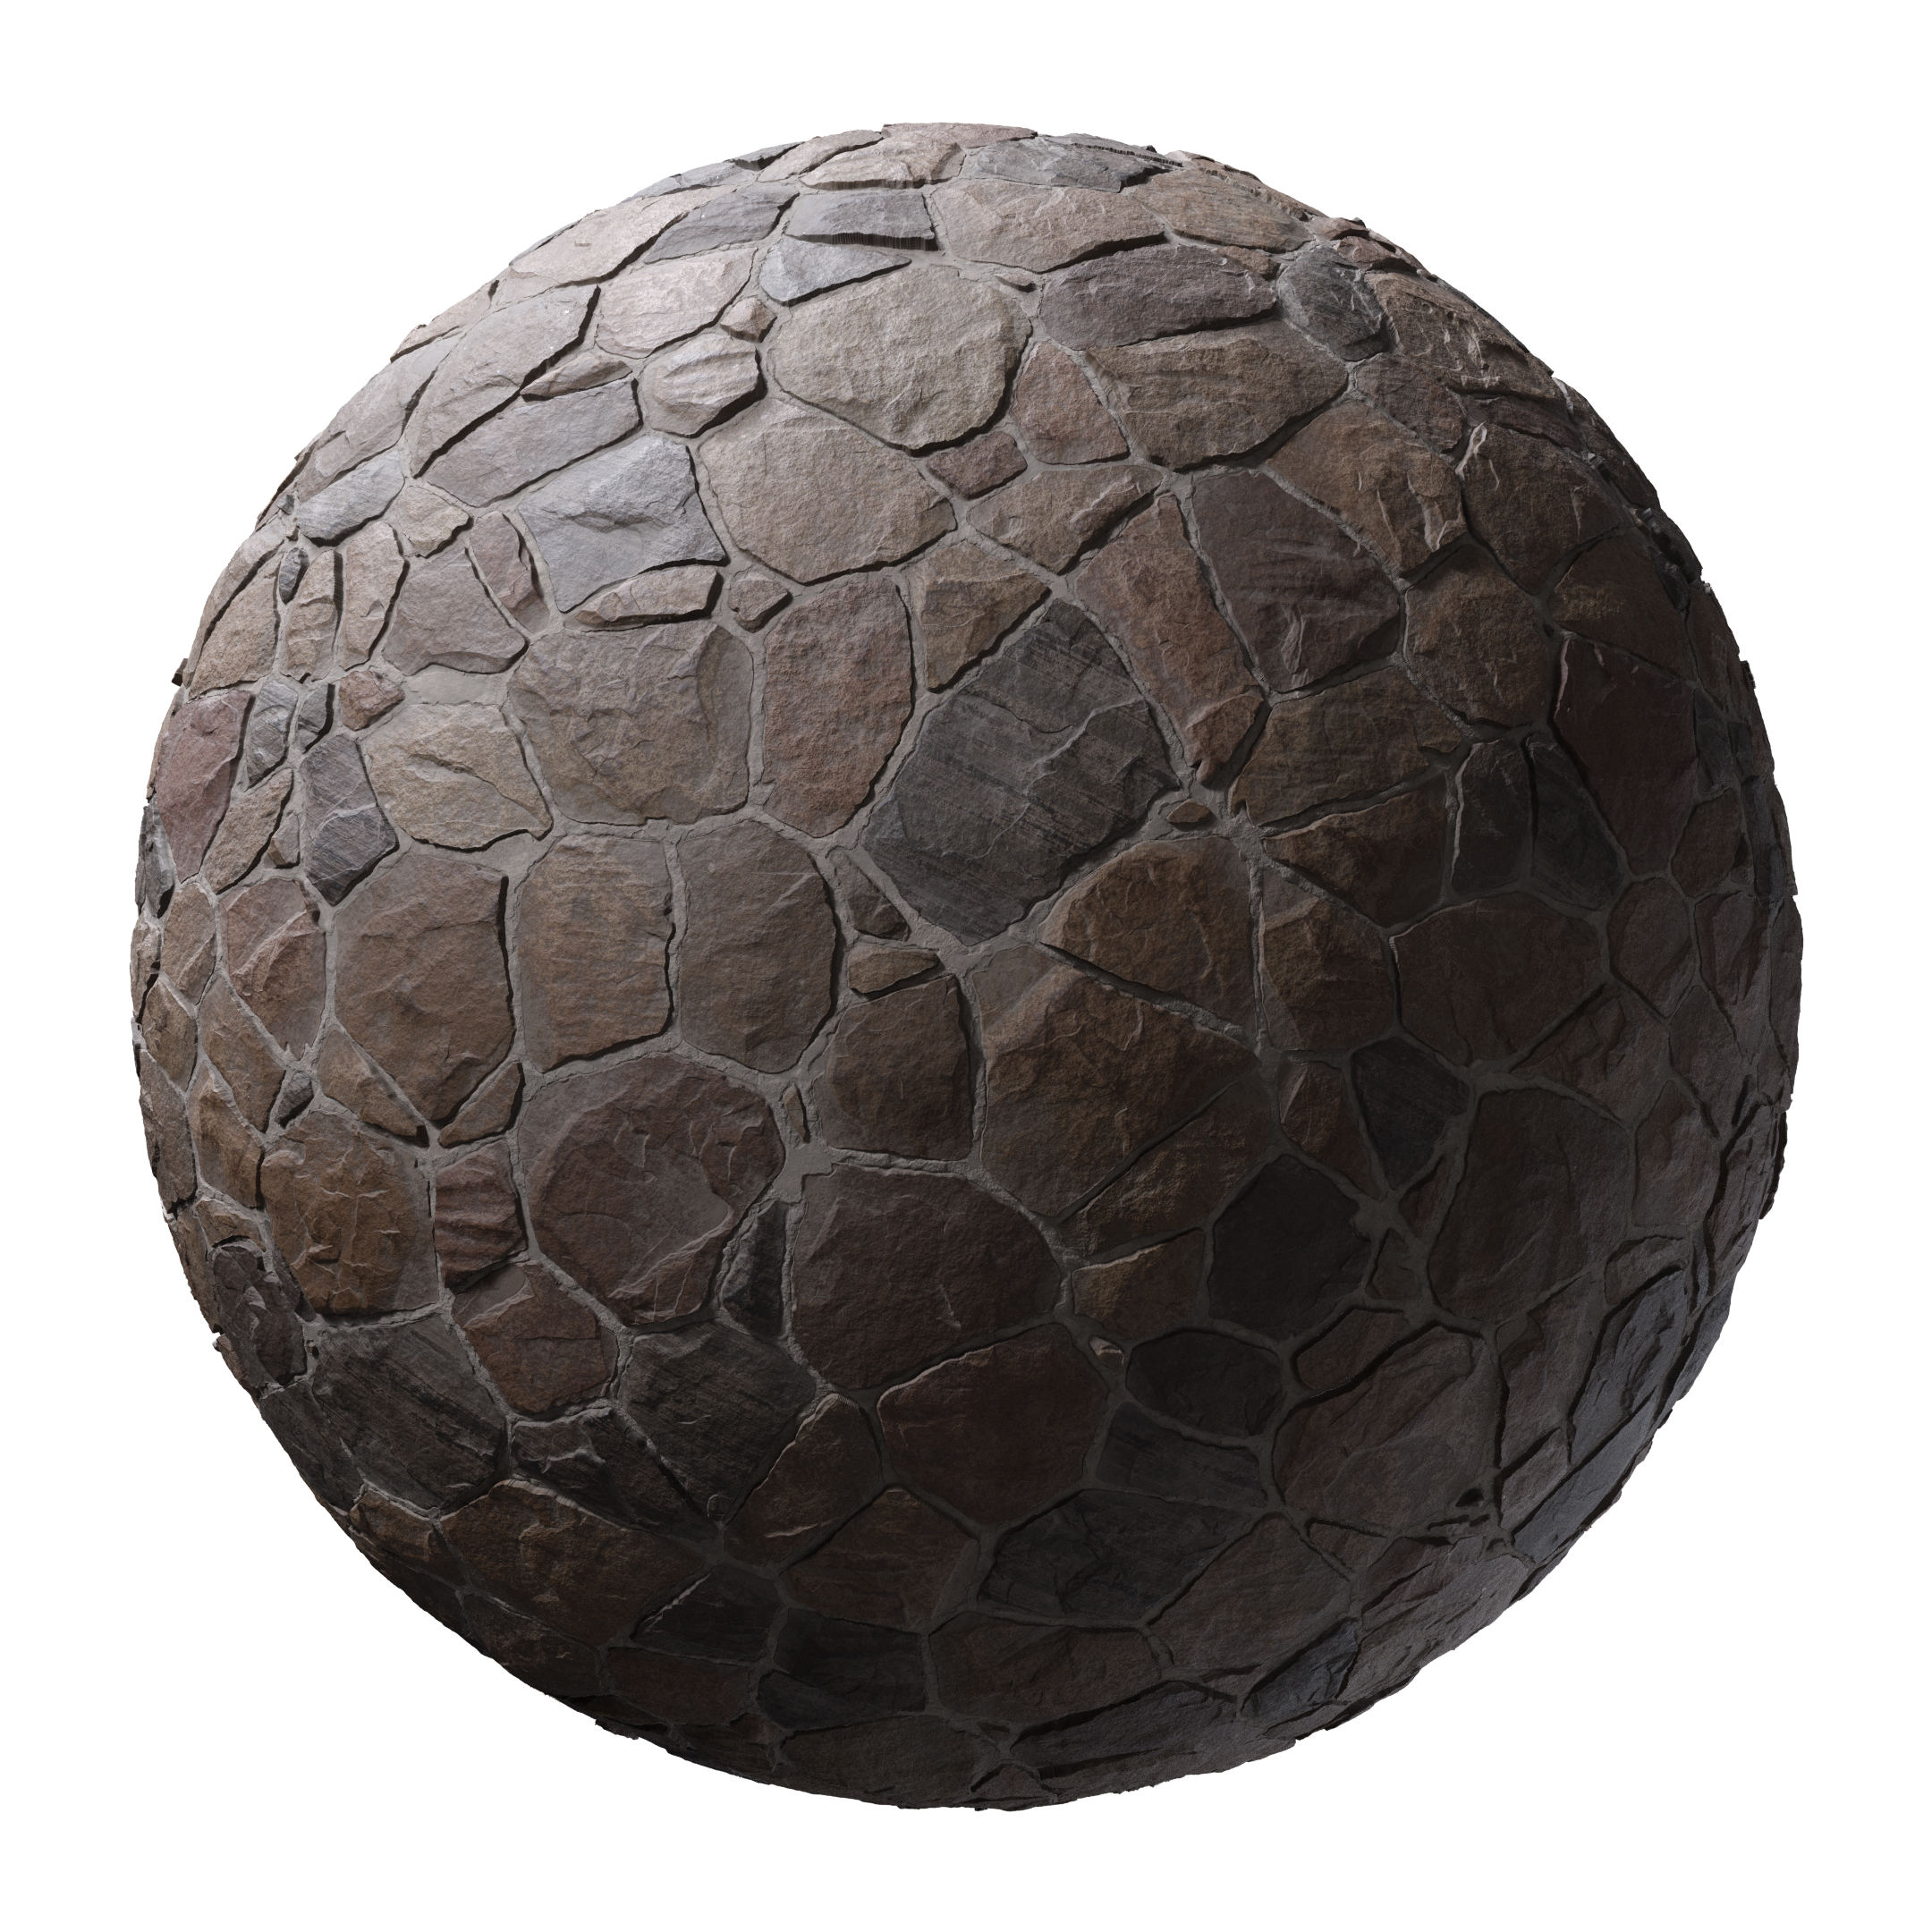 Tcom_Brick_StoneCladding_thumb1.png